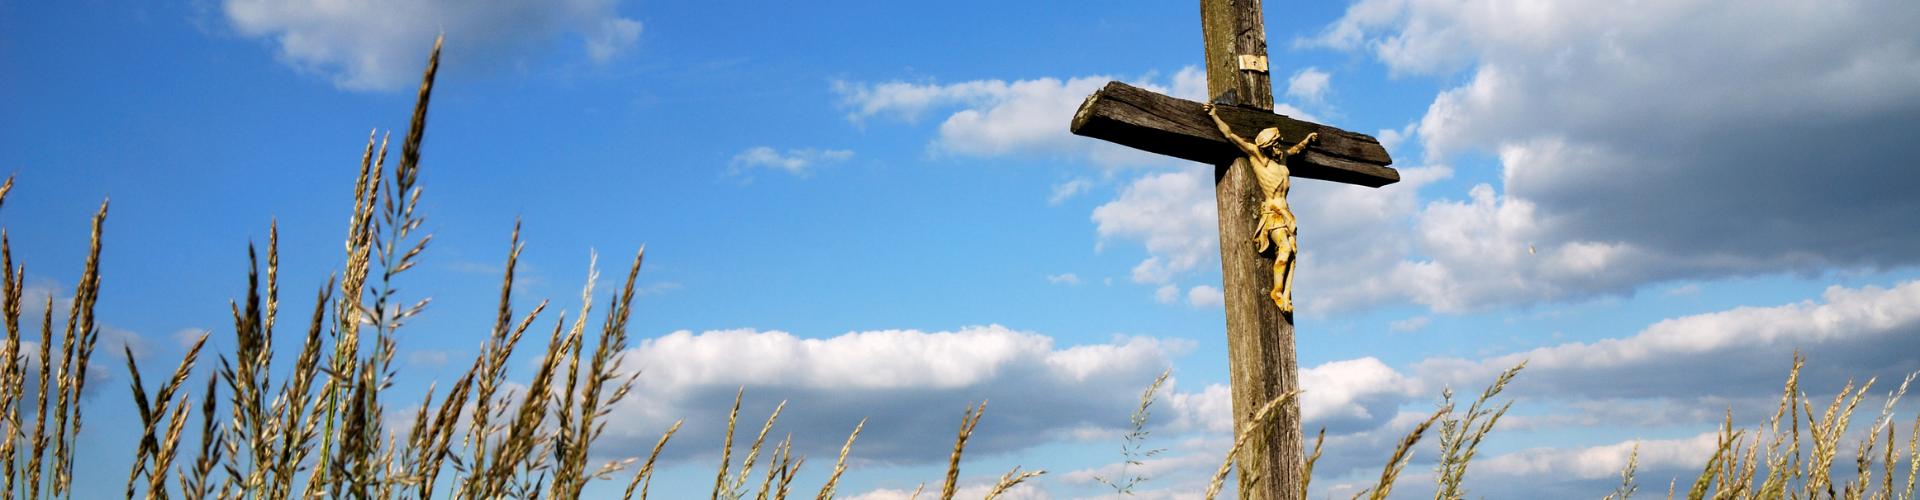 Polish National Catholic Church God's Field Publication